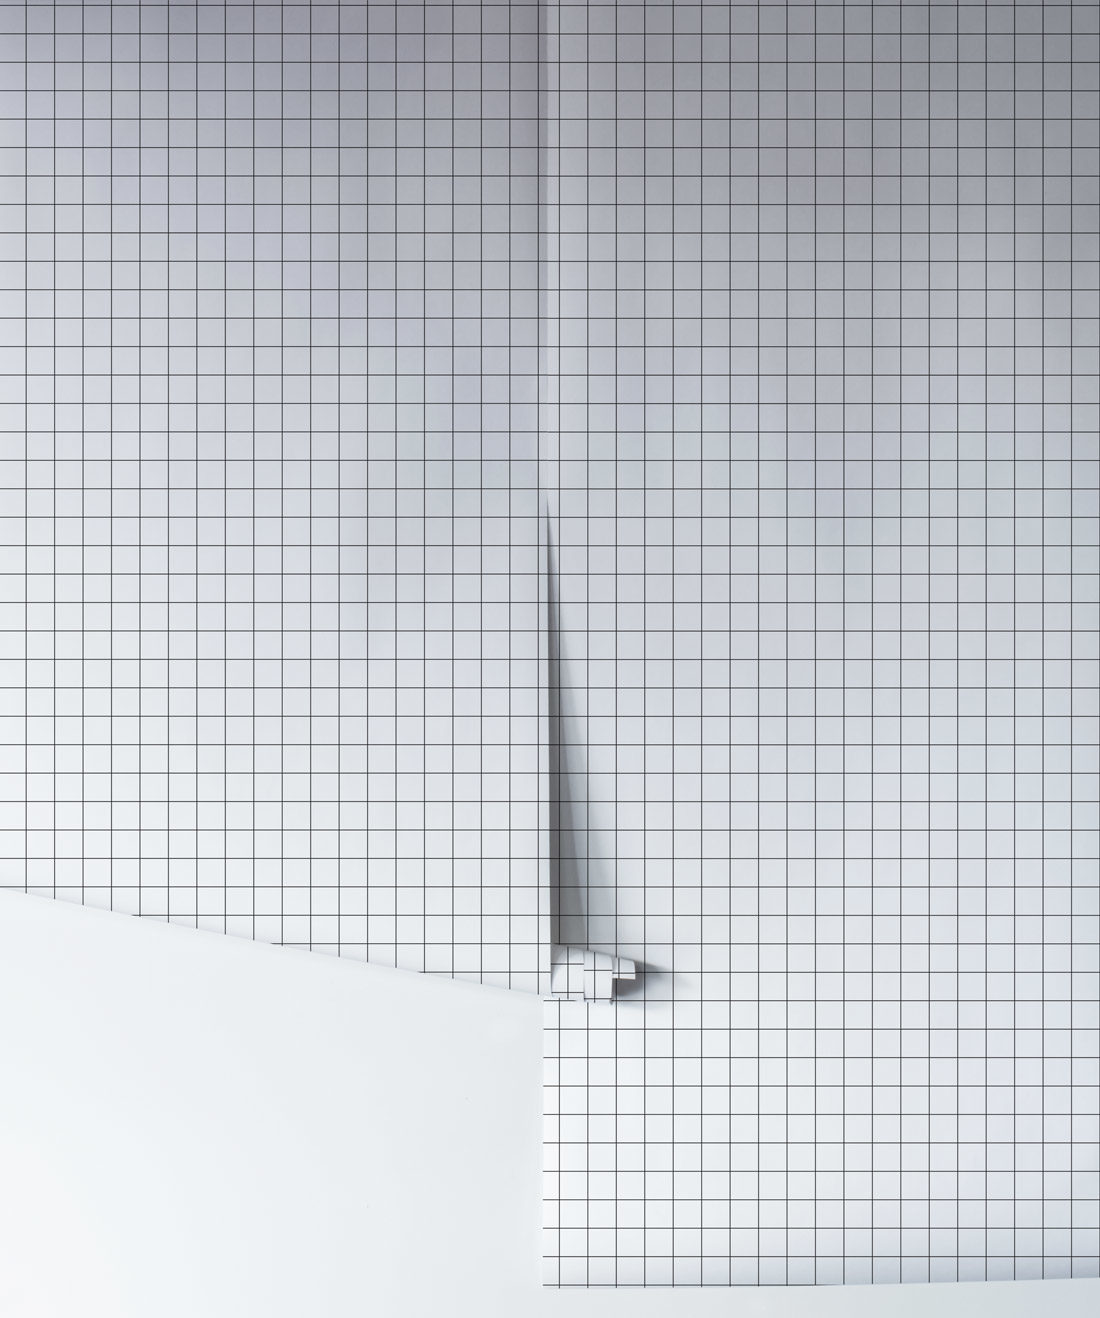 Contact Grid Wallpaper Simple Grid Pattern Wallpaper Milton King Aus